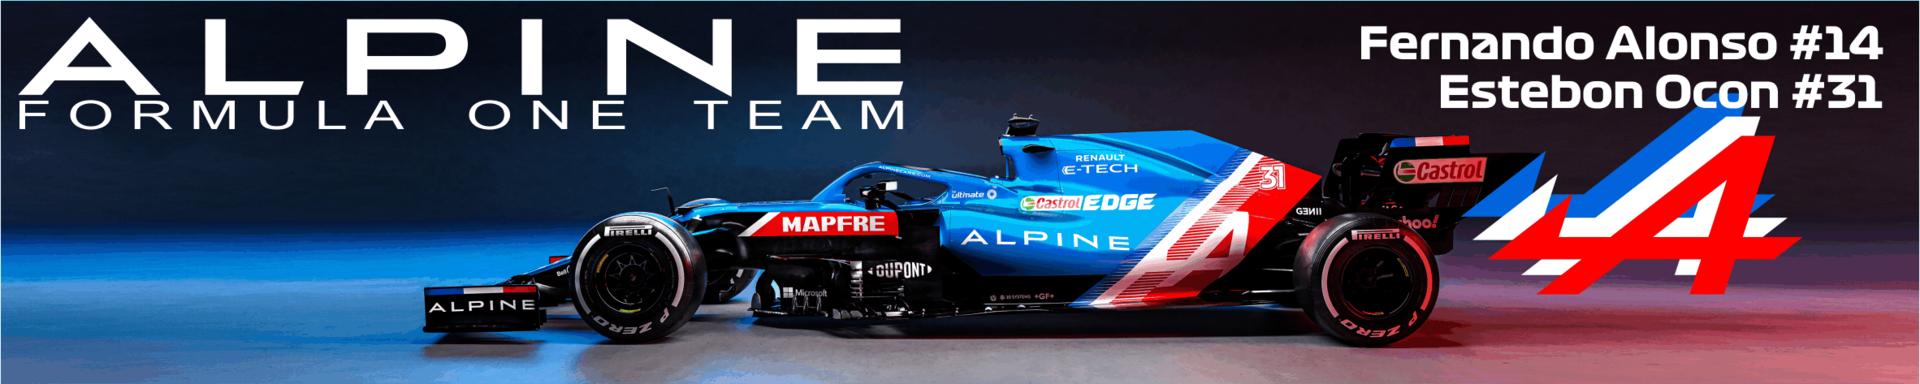 Alpine Formula One Team